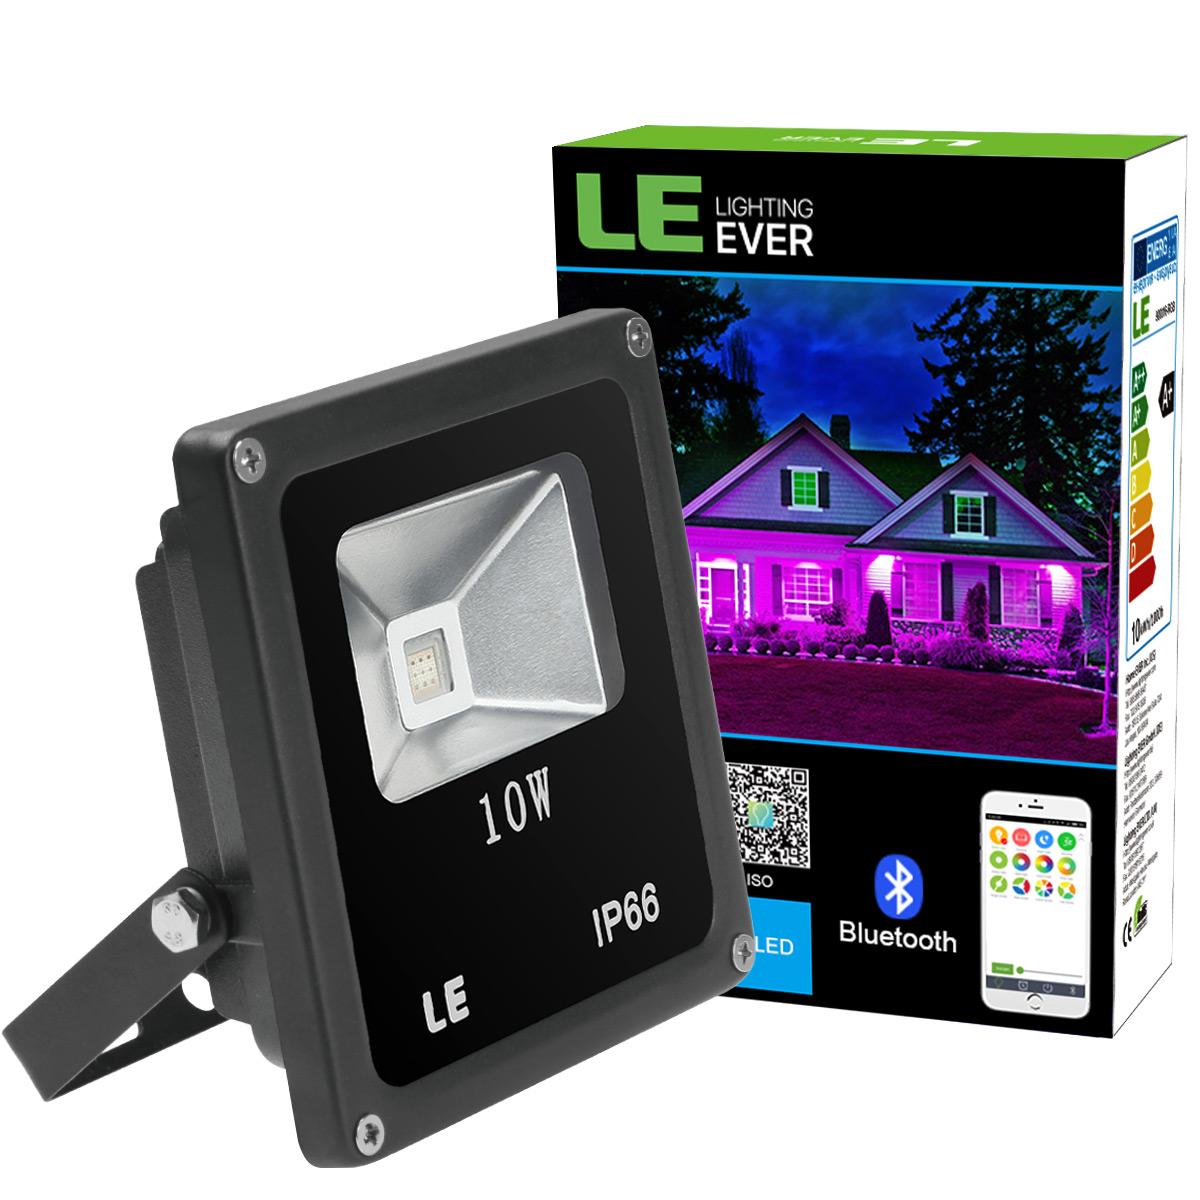 10W RGB LED Fluter, Mehrfarbiger Smart Bluetooth LED Scheinwerfer, Dimmbar, Farbwechsel, wasserdichter Flutlicht, Partylampe